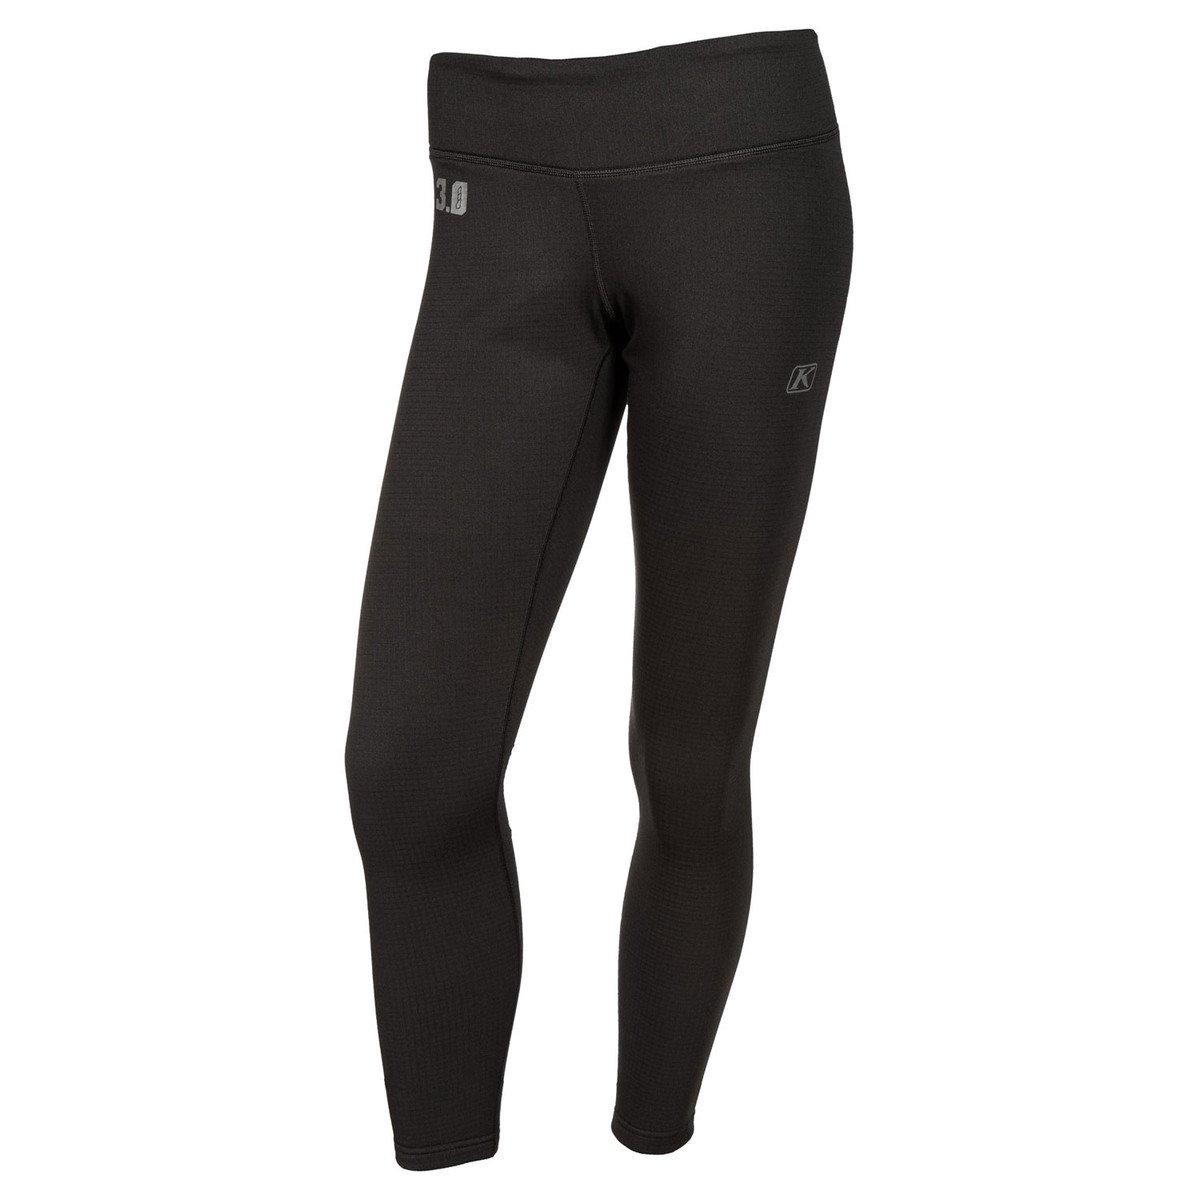 Klim Solstice 3.0 Pants Womens Undergarmentオフロード/ダートバイクBody Armor – ブラック L ブラック 3288-001-140-000 B01GSPQAUO ブラック L